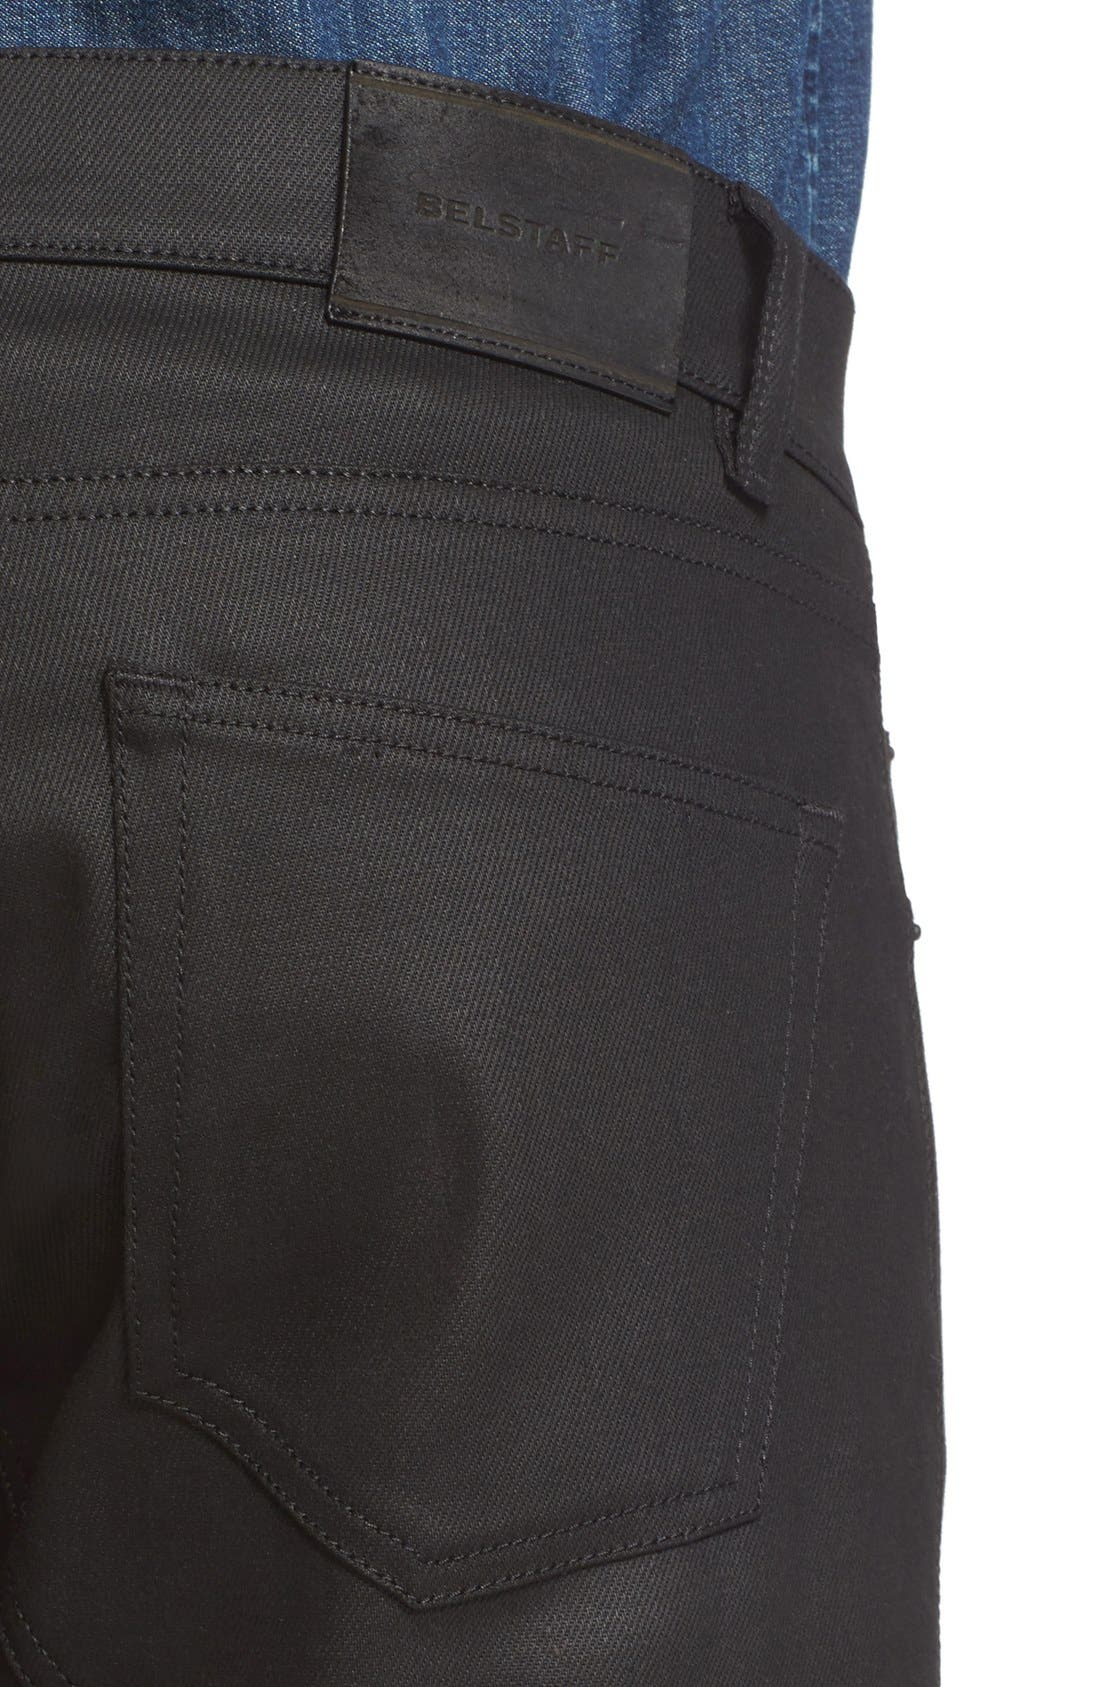 Westham Raw Stretch Denim Moto Jeans,                             Alternate thumbnail 7, color,                             001